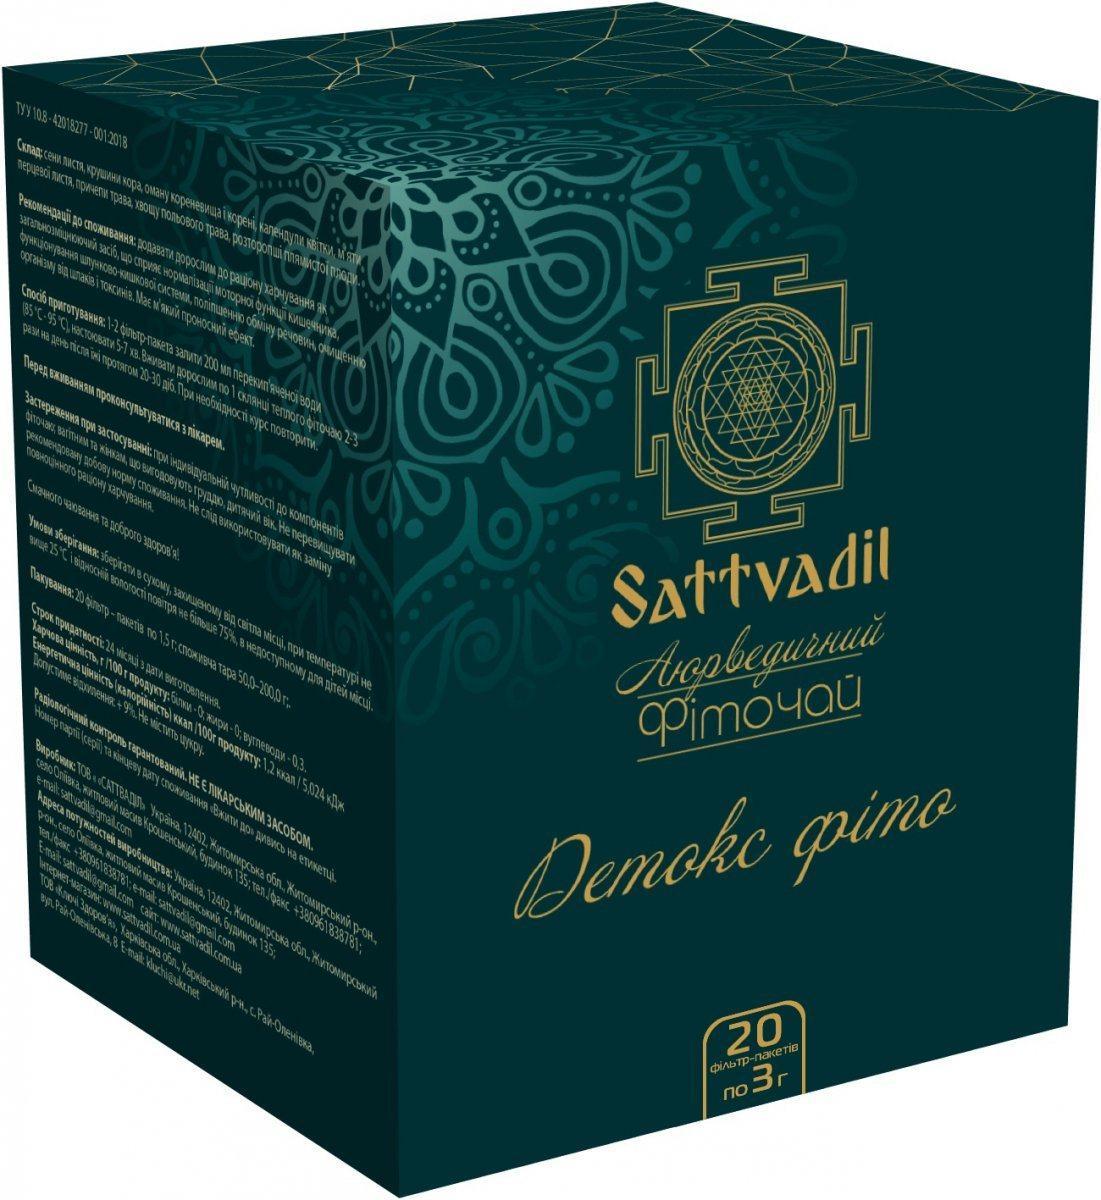 Аюрведический чай Детокс фито Sattvadil, 20 пакетиков